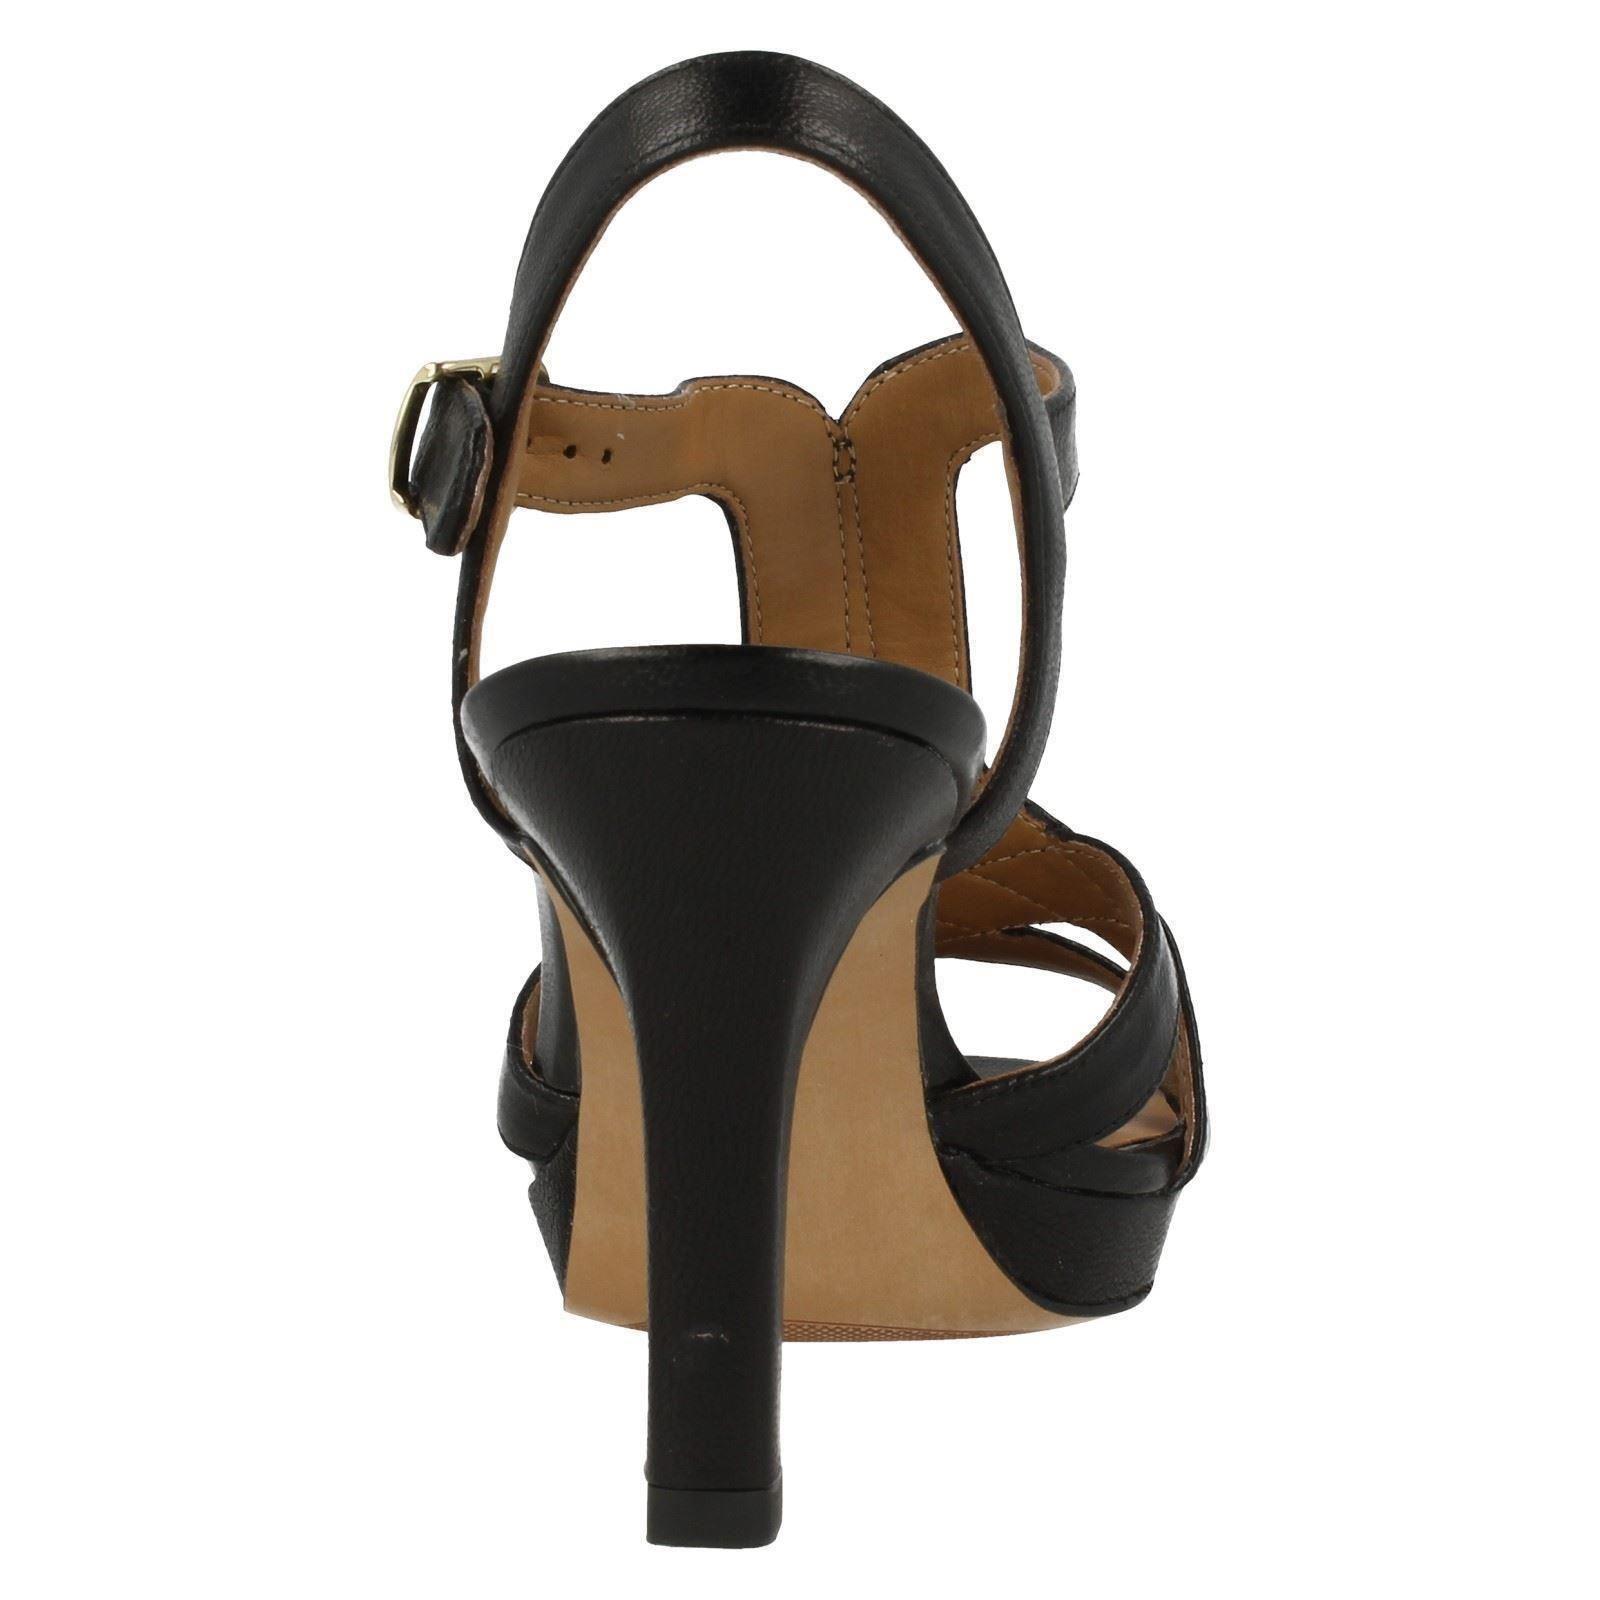 7f99d0f56a12 Ladies-Clarks-High-Heeled-Fashion-Sandals-Delsie-Risa thumbnail